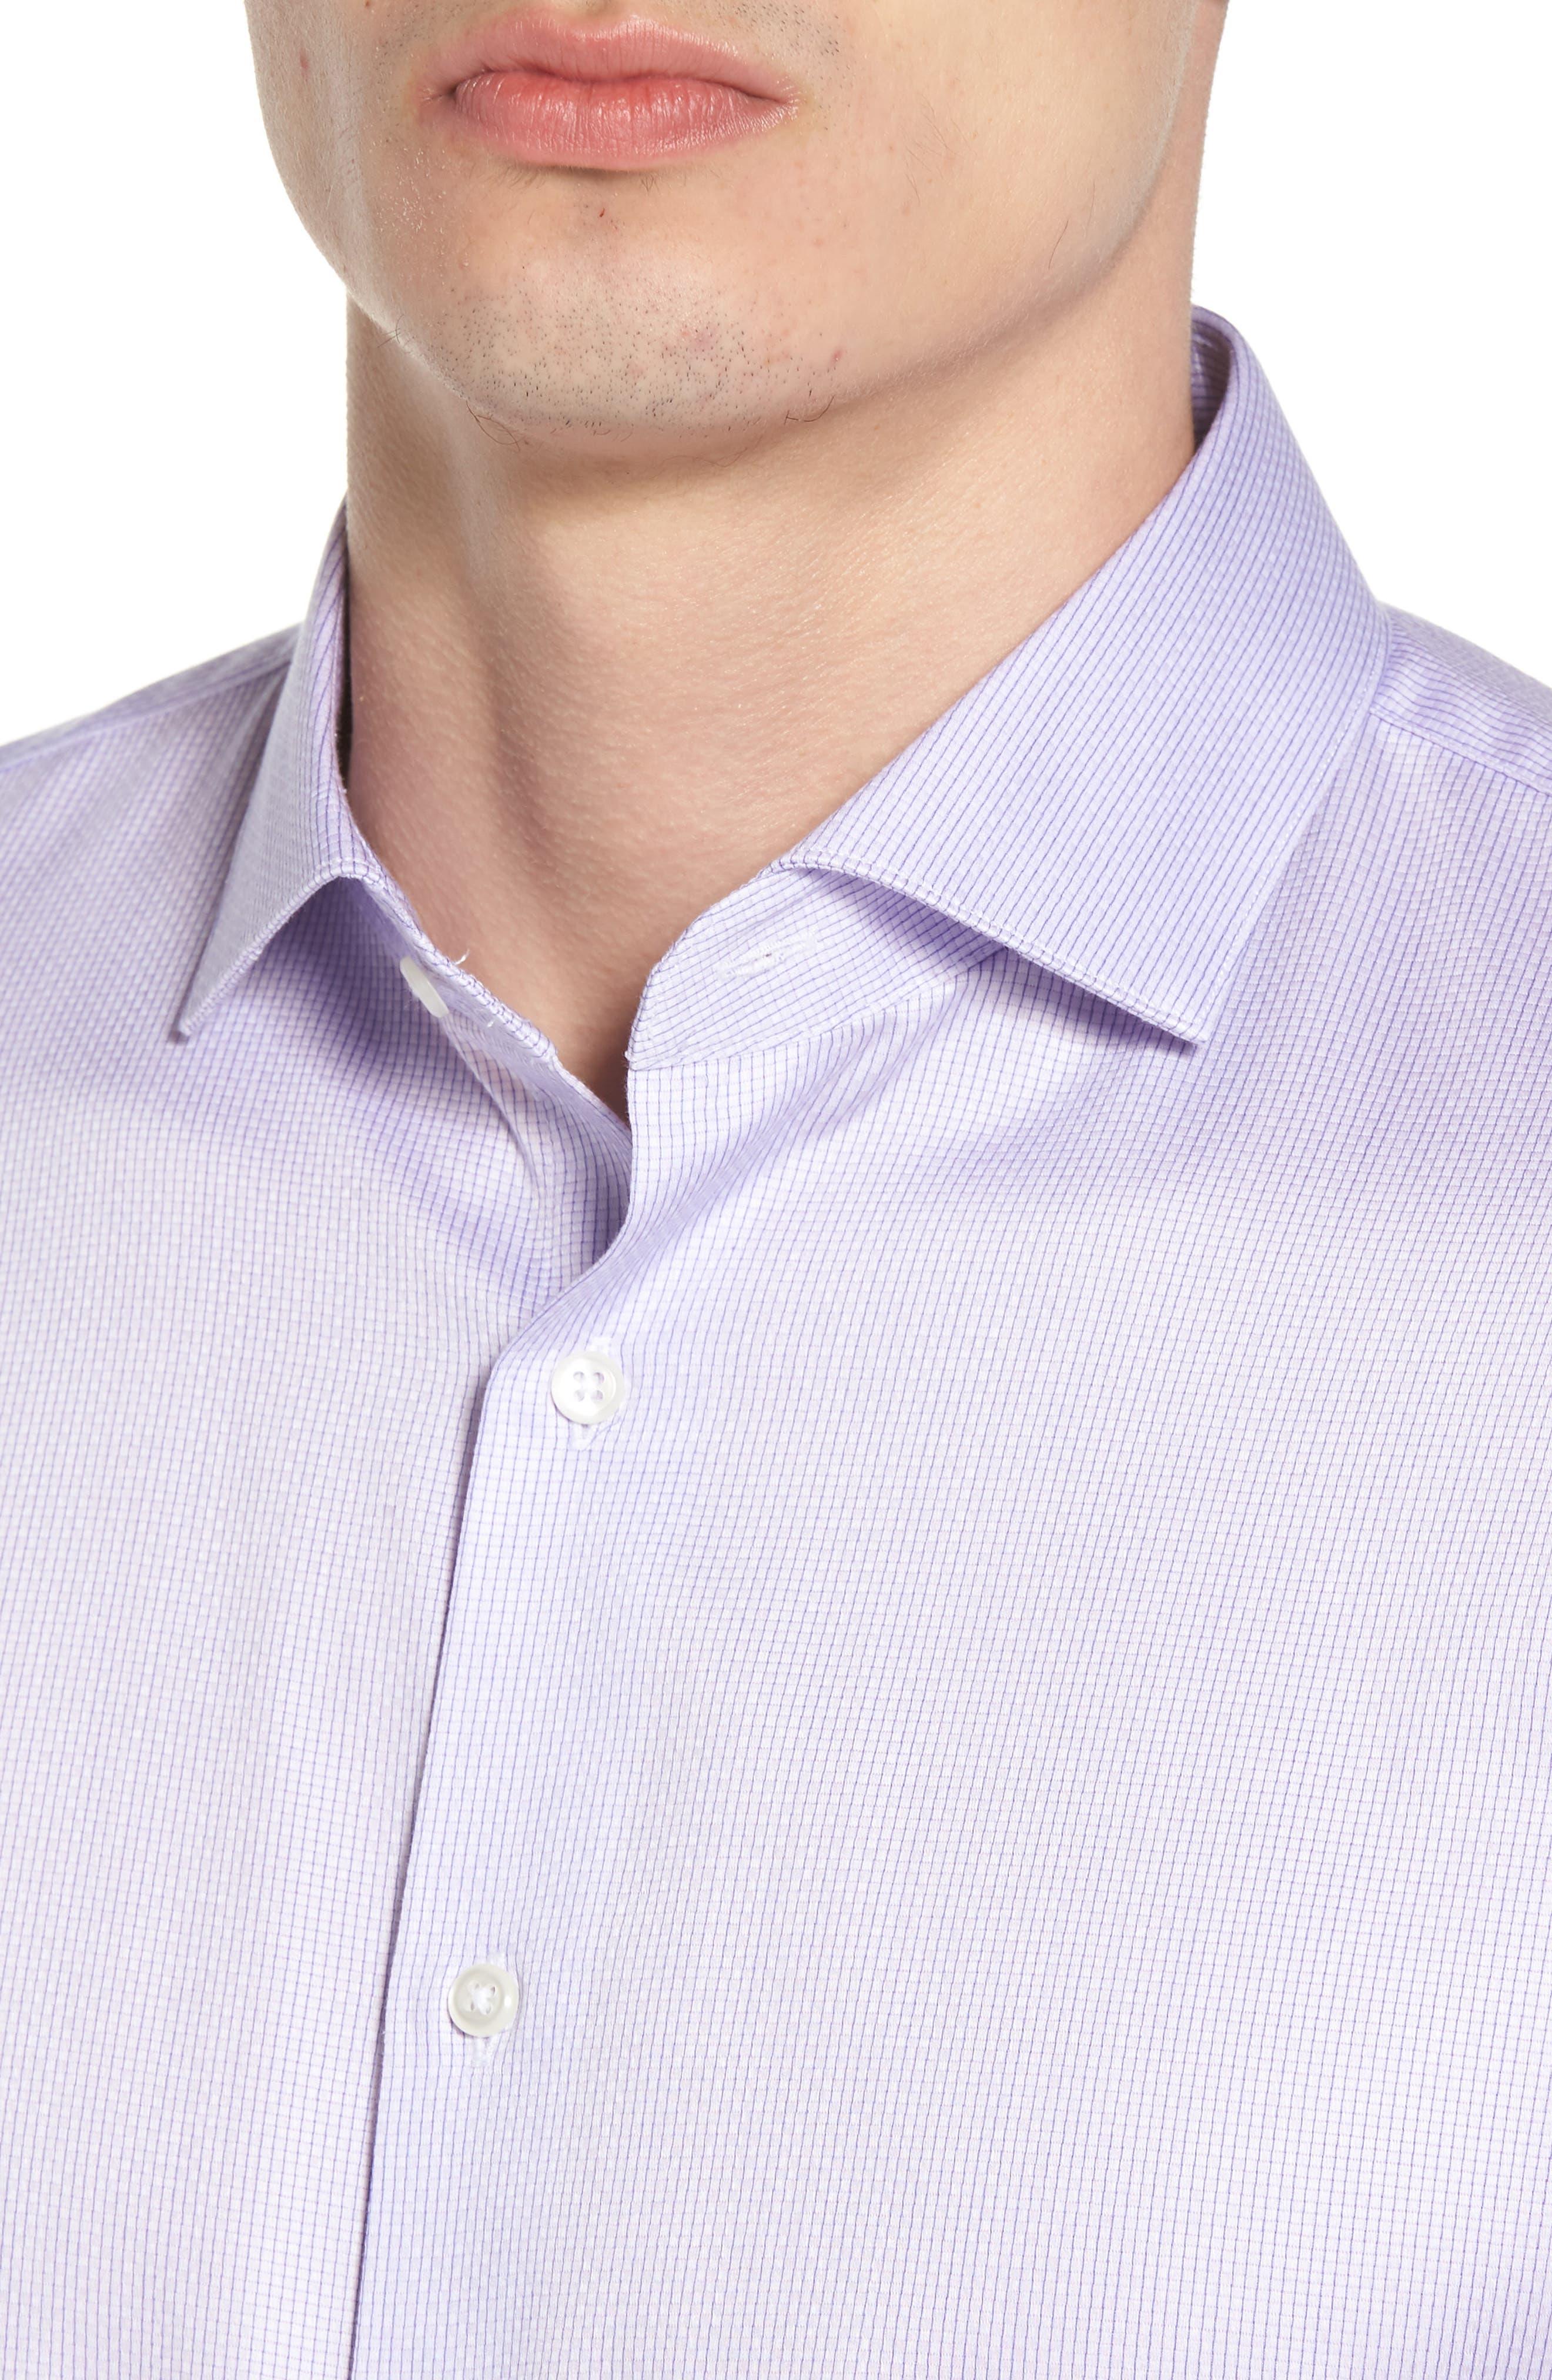 Trim Fit Stripe Dress Shirt,                             Alternate thumbnail 6, color,